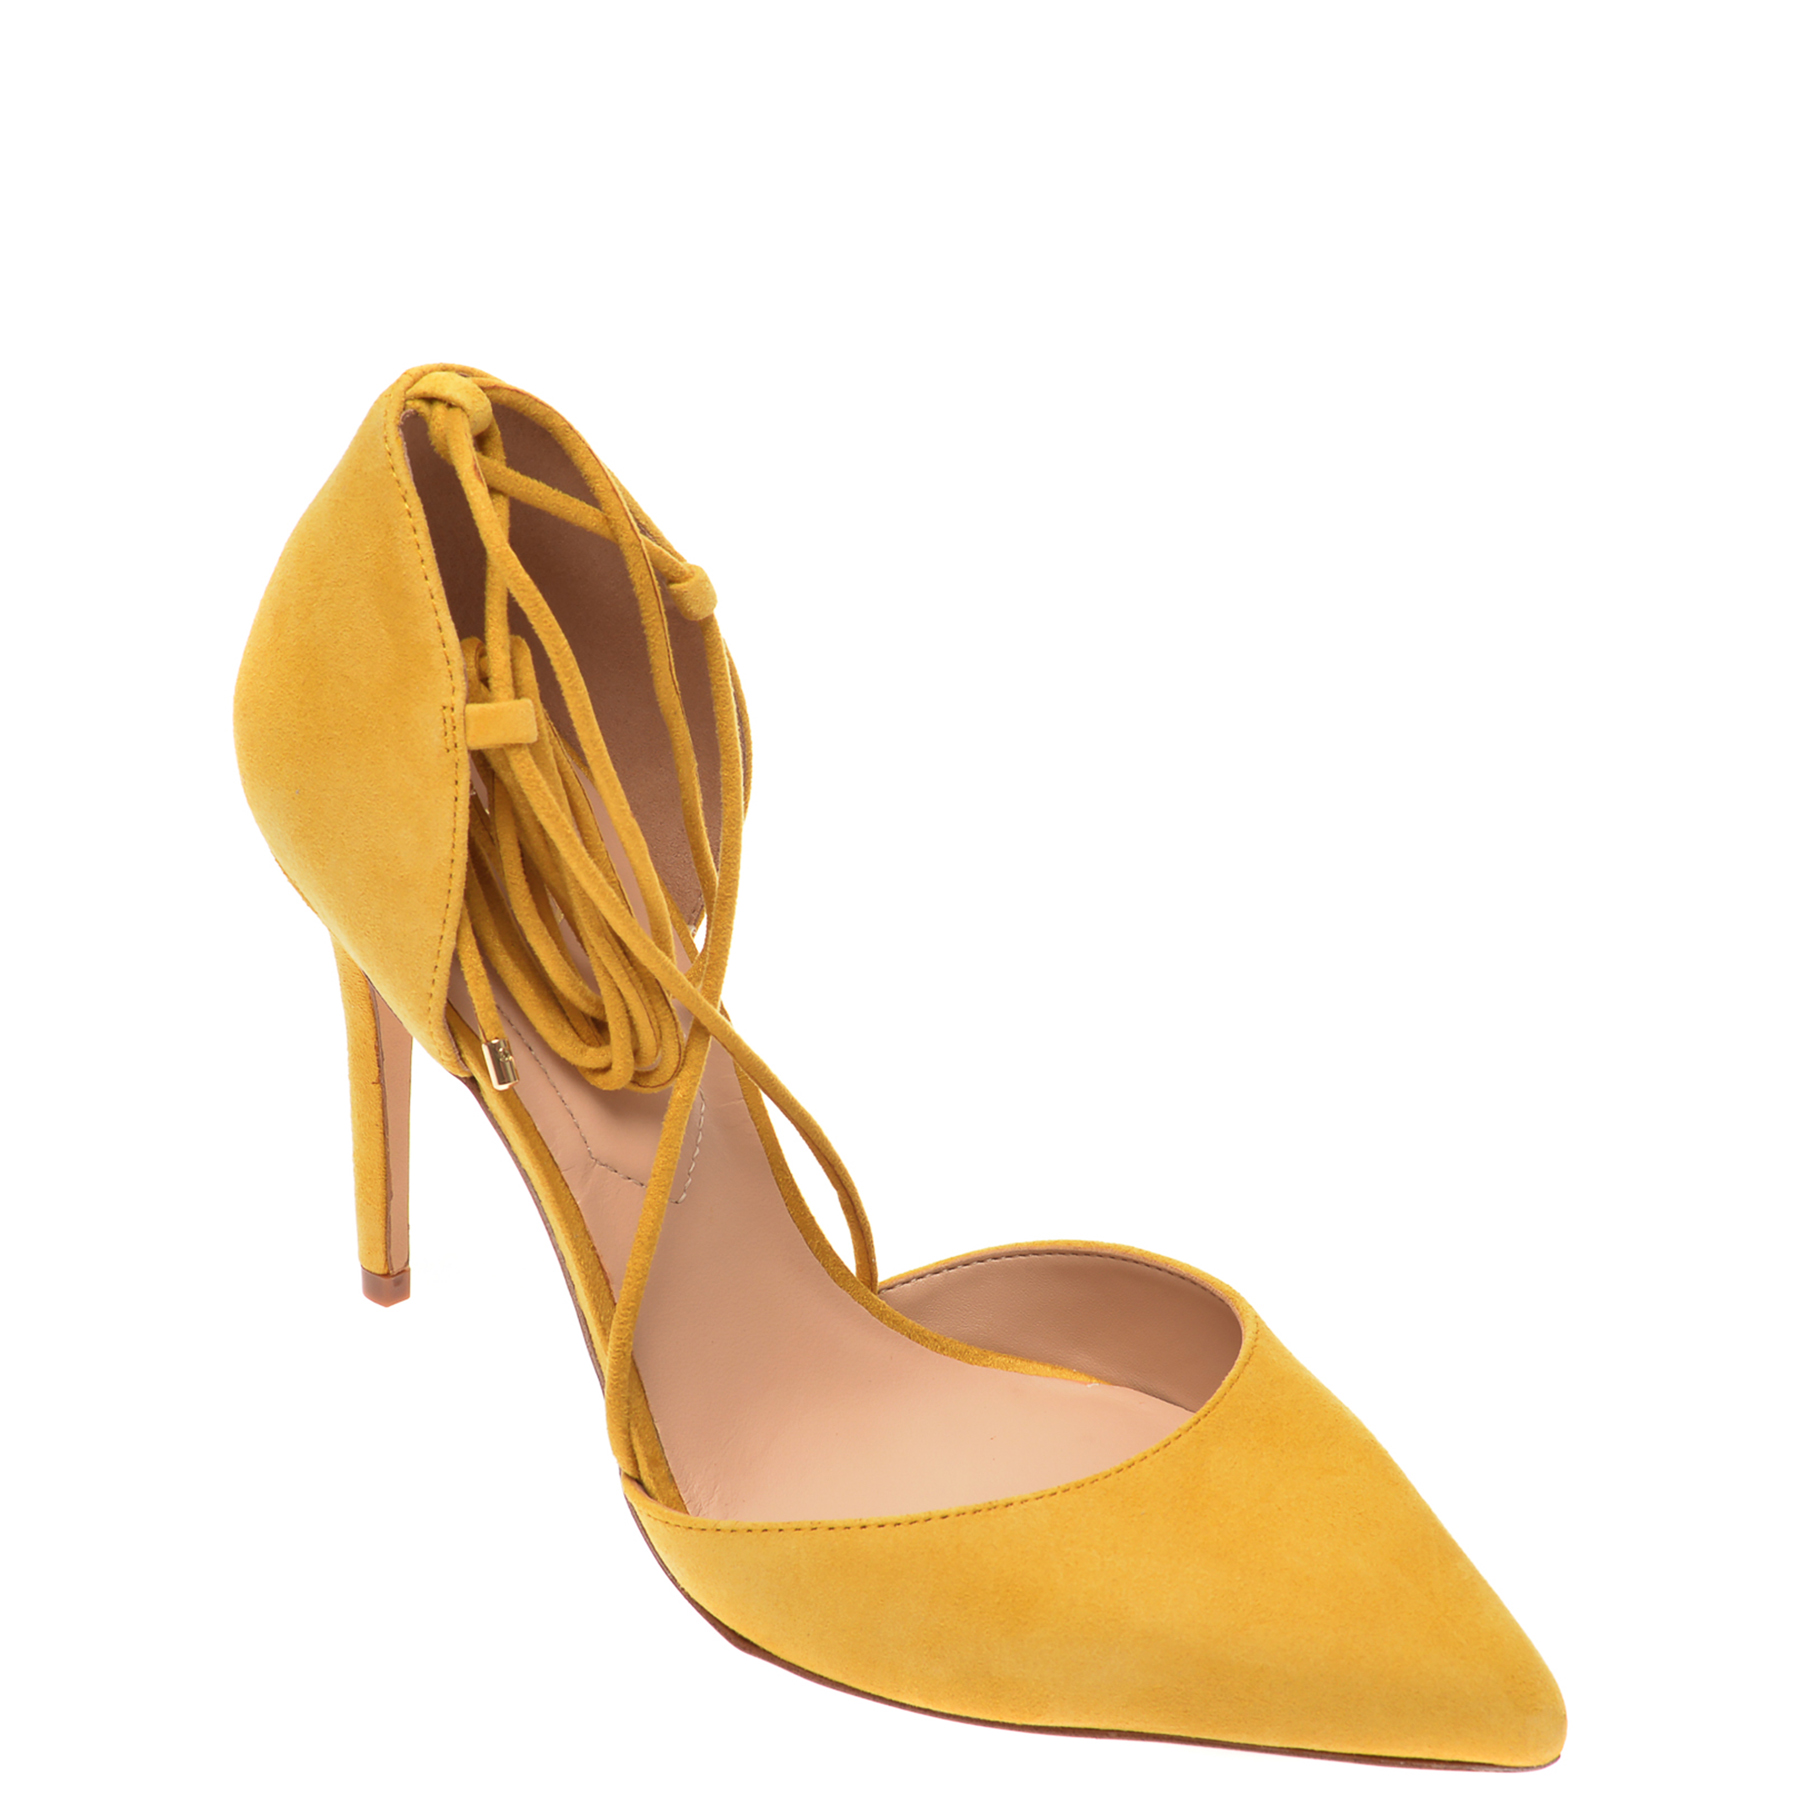 Pantofi ALDO galbeni, Finsbury730, din piele intoarsa imagine otter.ro 2021